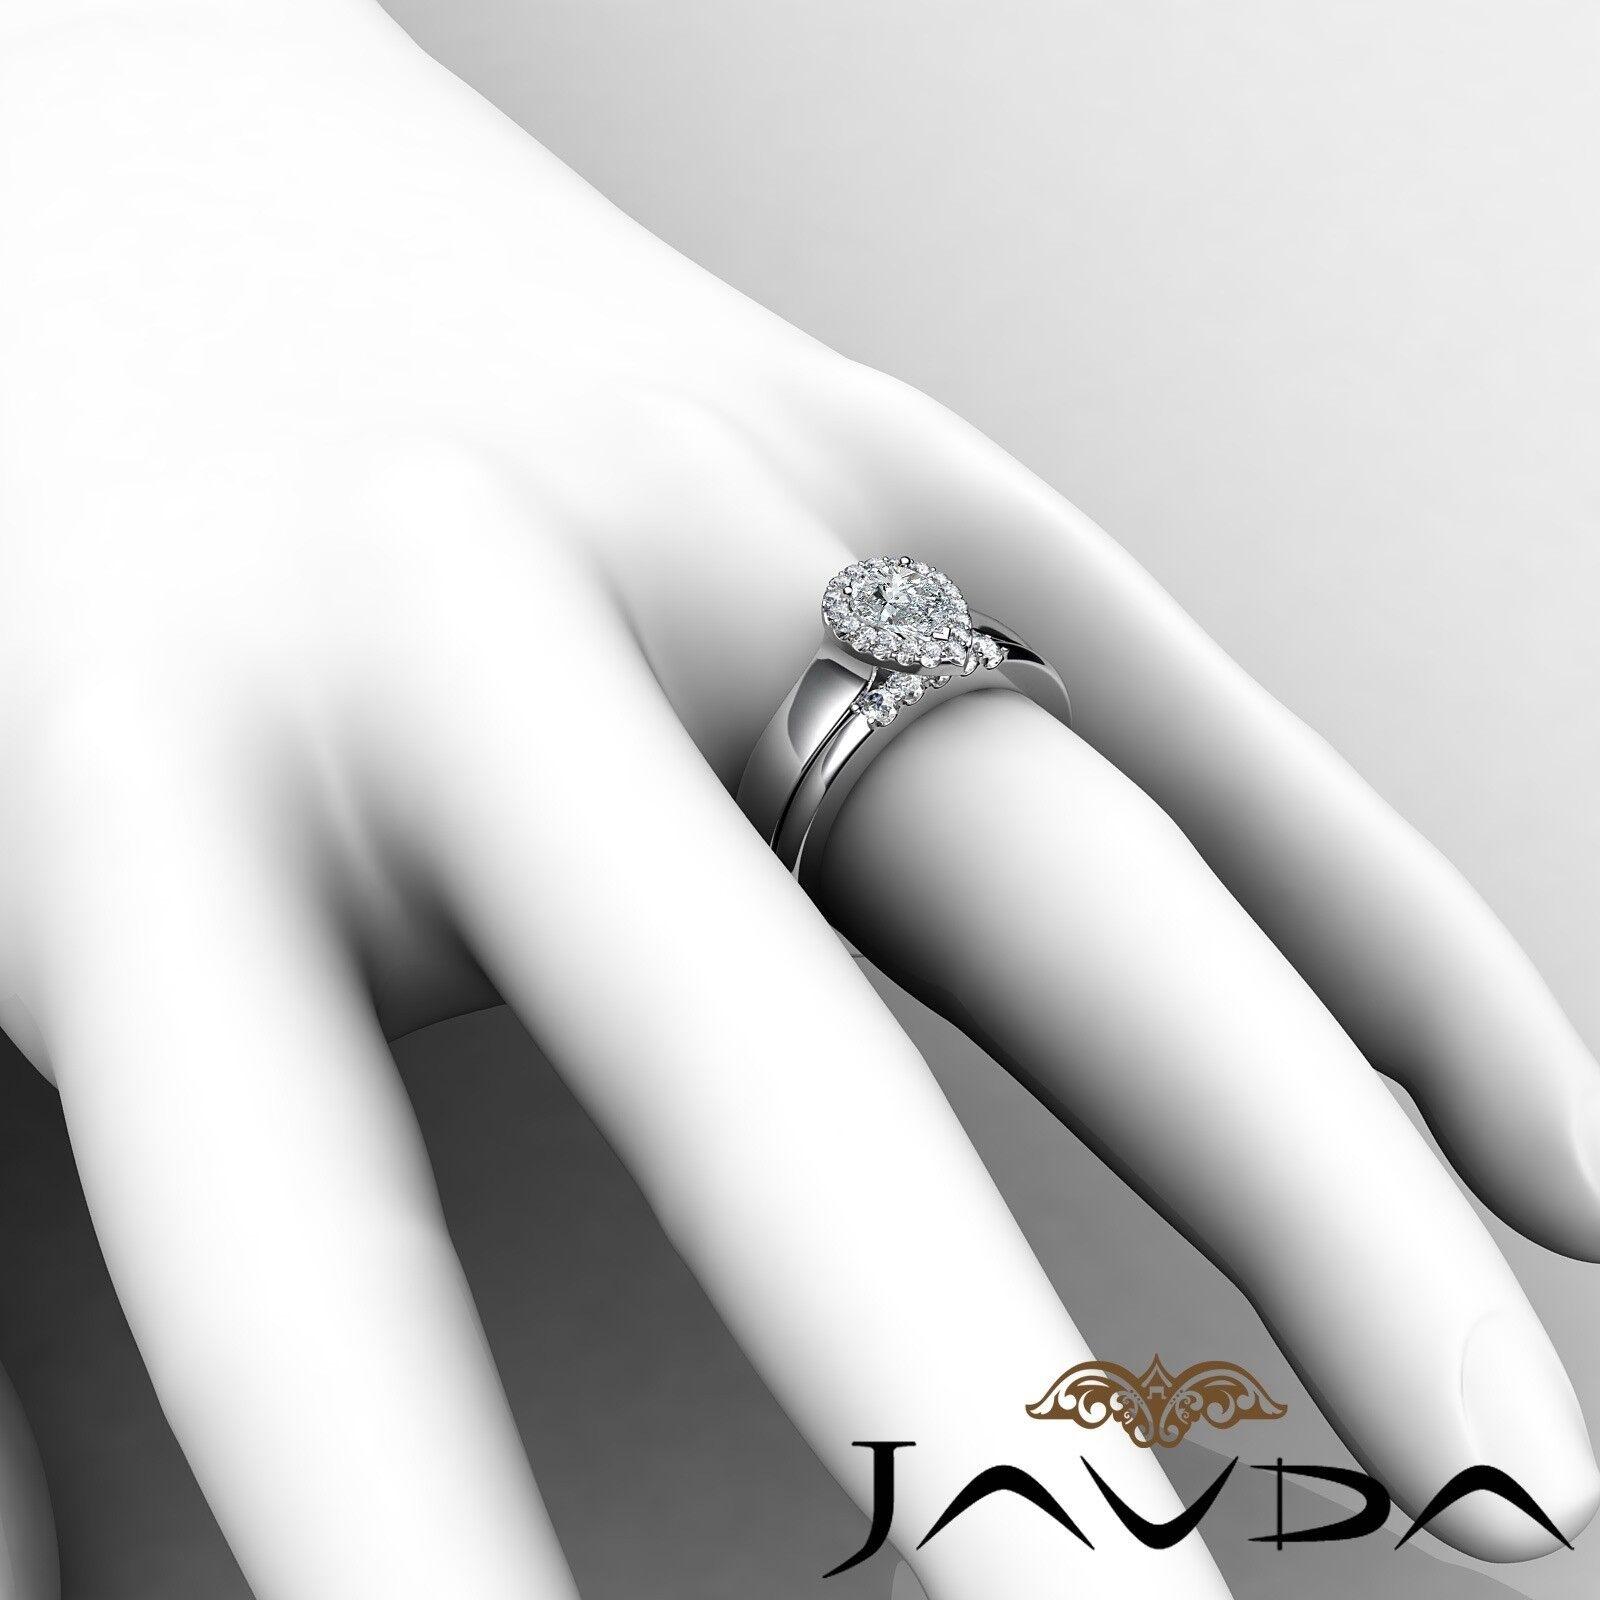 1.33ctw U Cut Pave Set Halo Bridal Pear Diamond Engagement Ring GIA F-VS2 W Gold 6